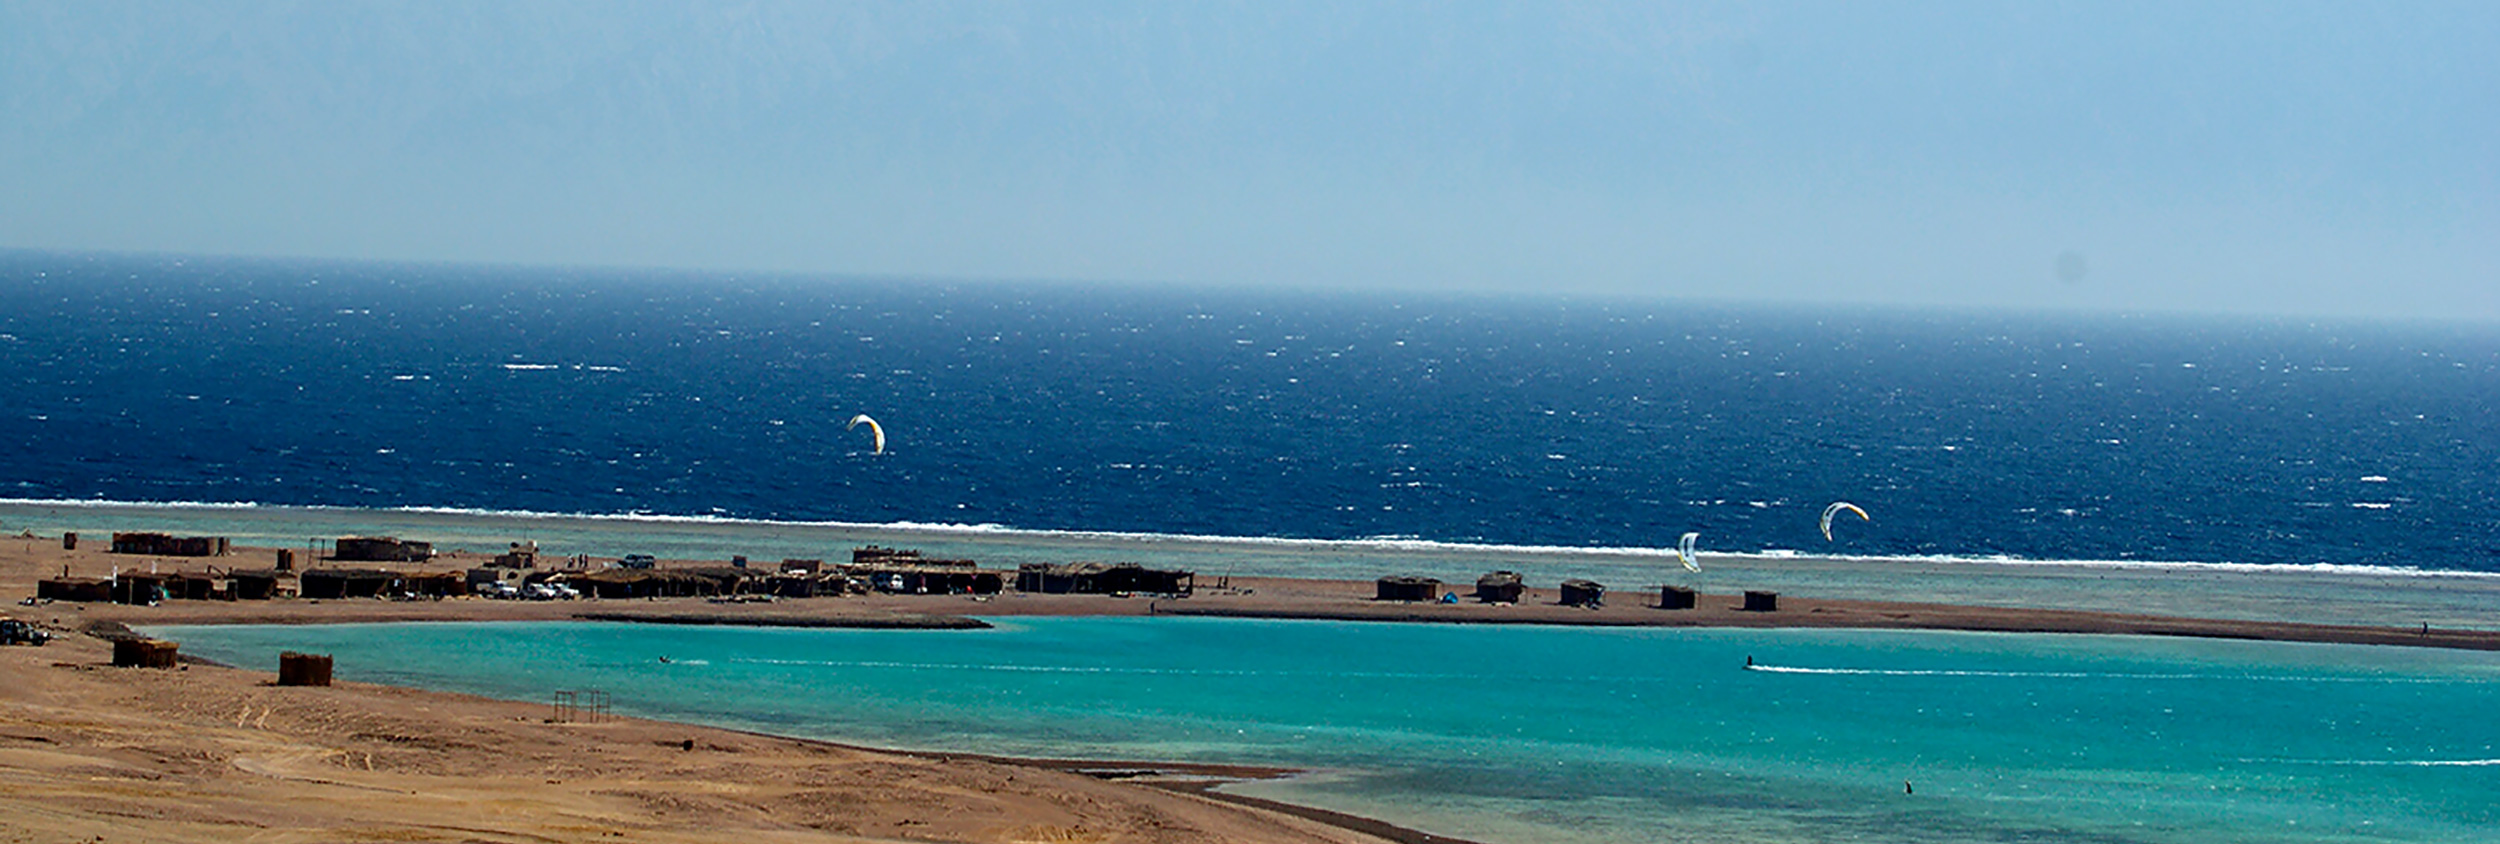 GP Kite school Egypt Dahab